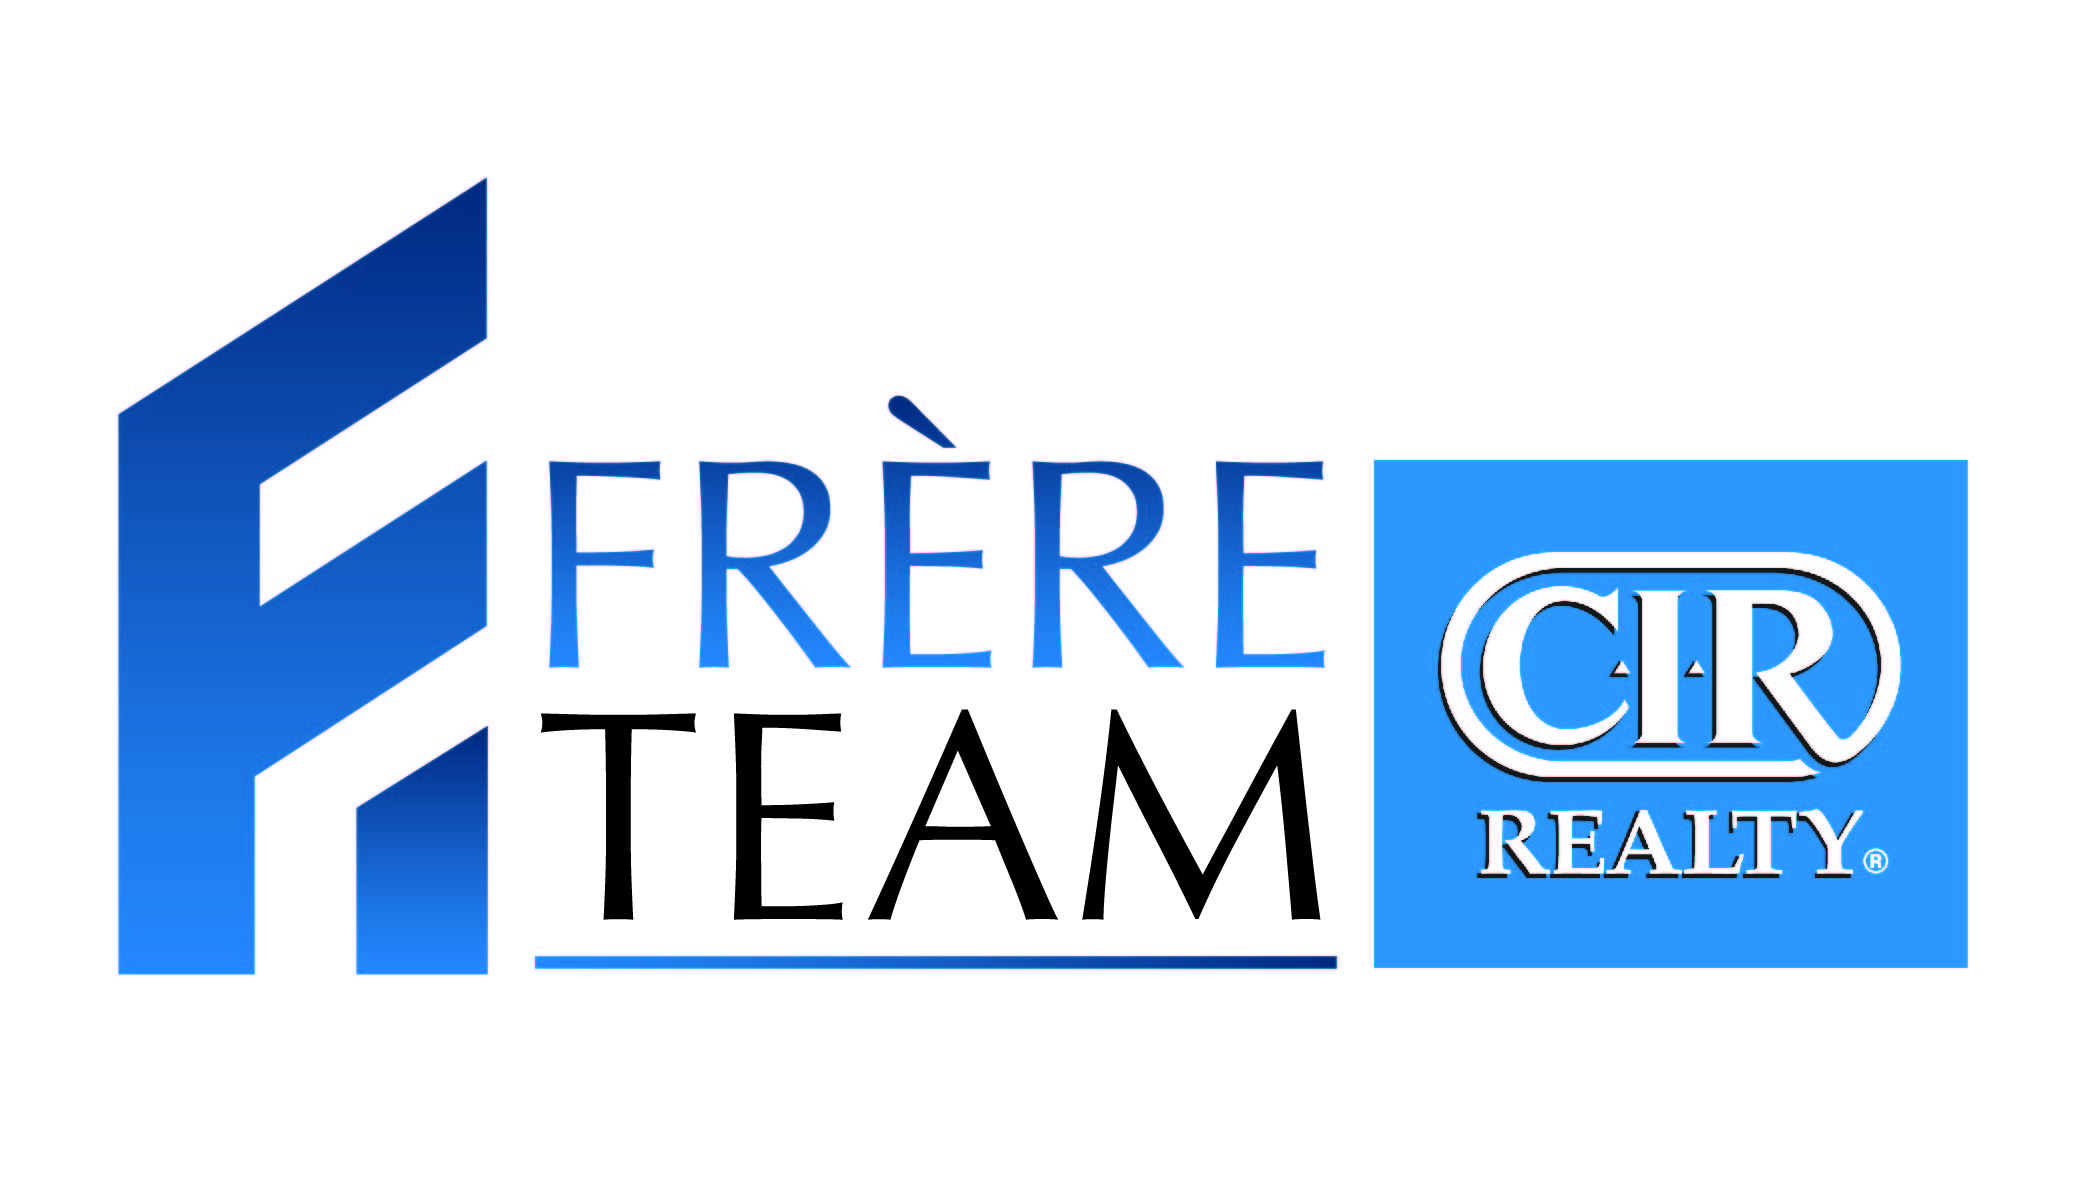 FrereTeam_CIR-01 (3).jpg